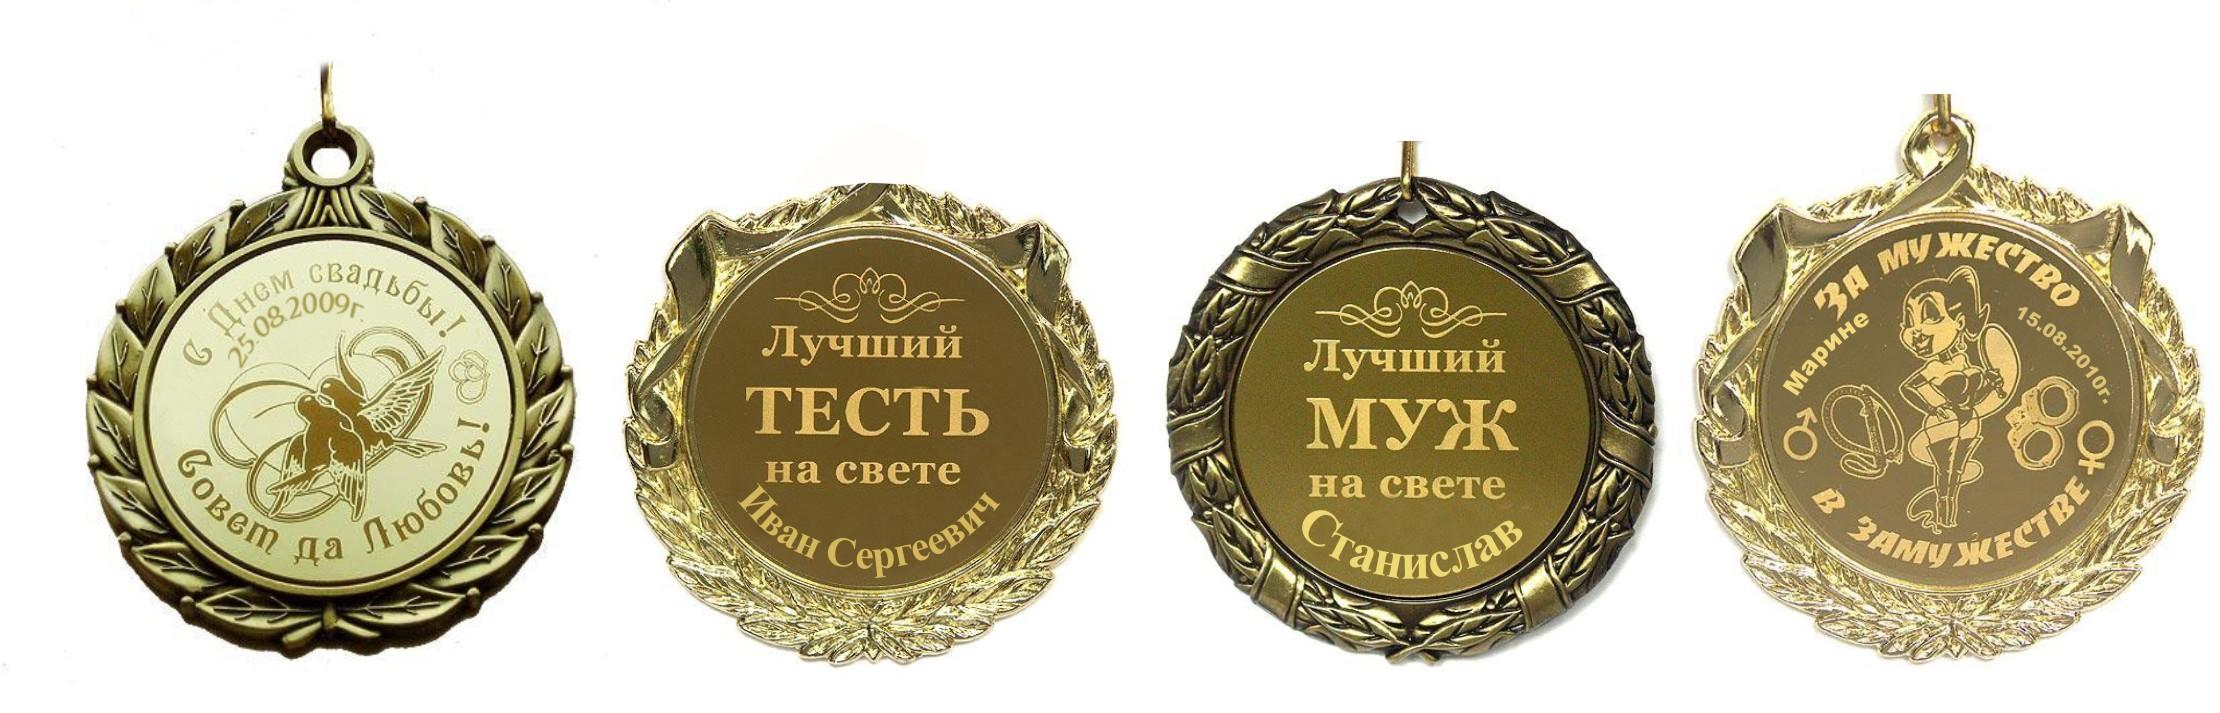 Фото медалей на свадьбу